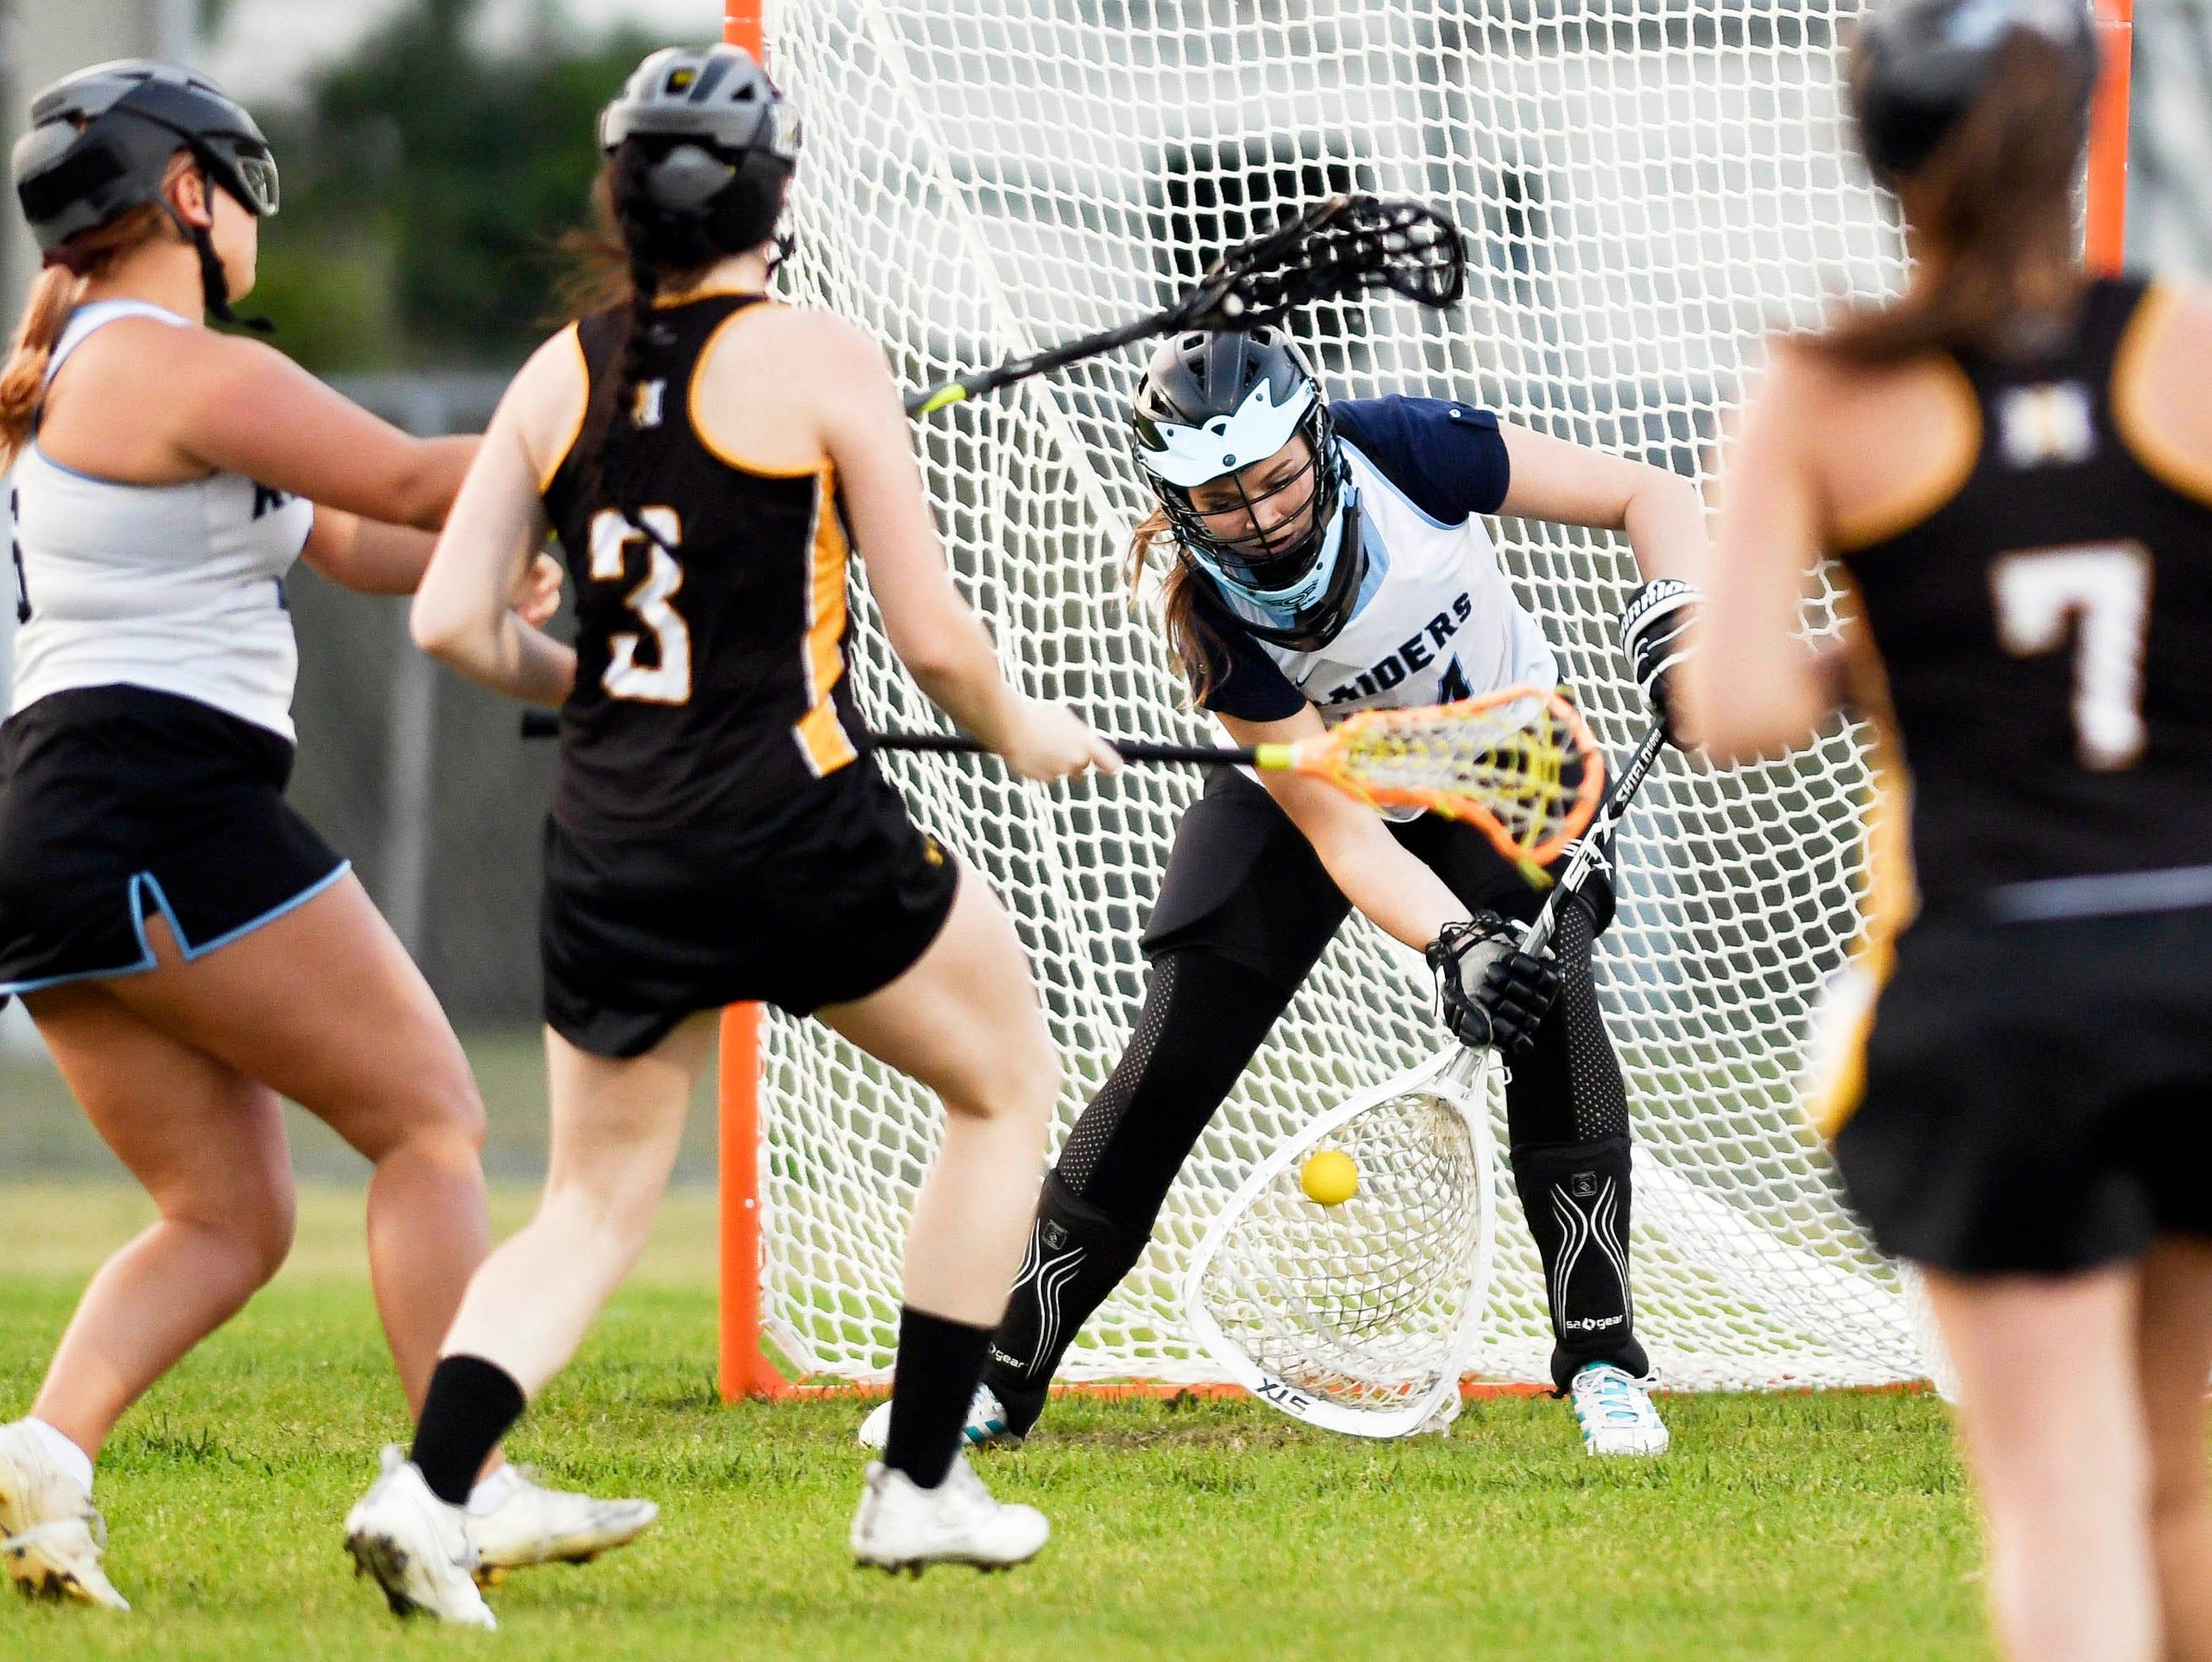 Melanie Mahaffey of Rockledge makes a save during Tuesday's game against Merritt Island.